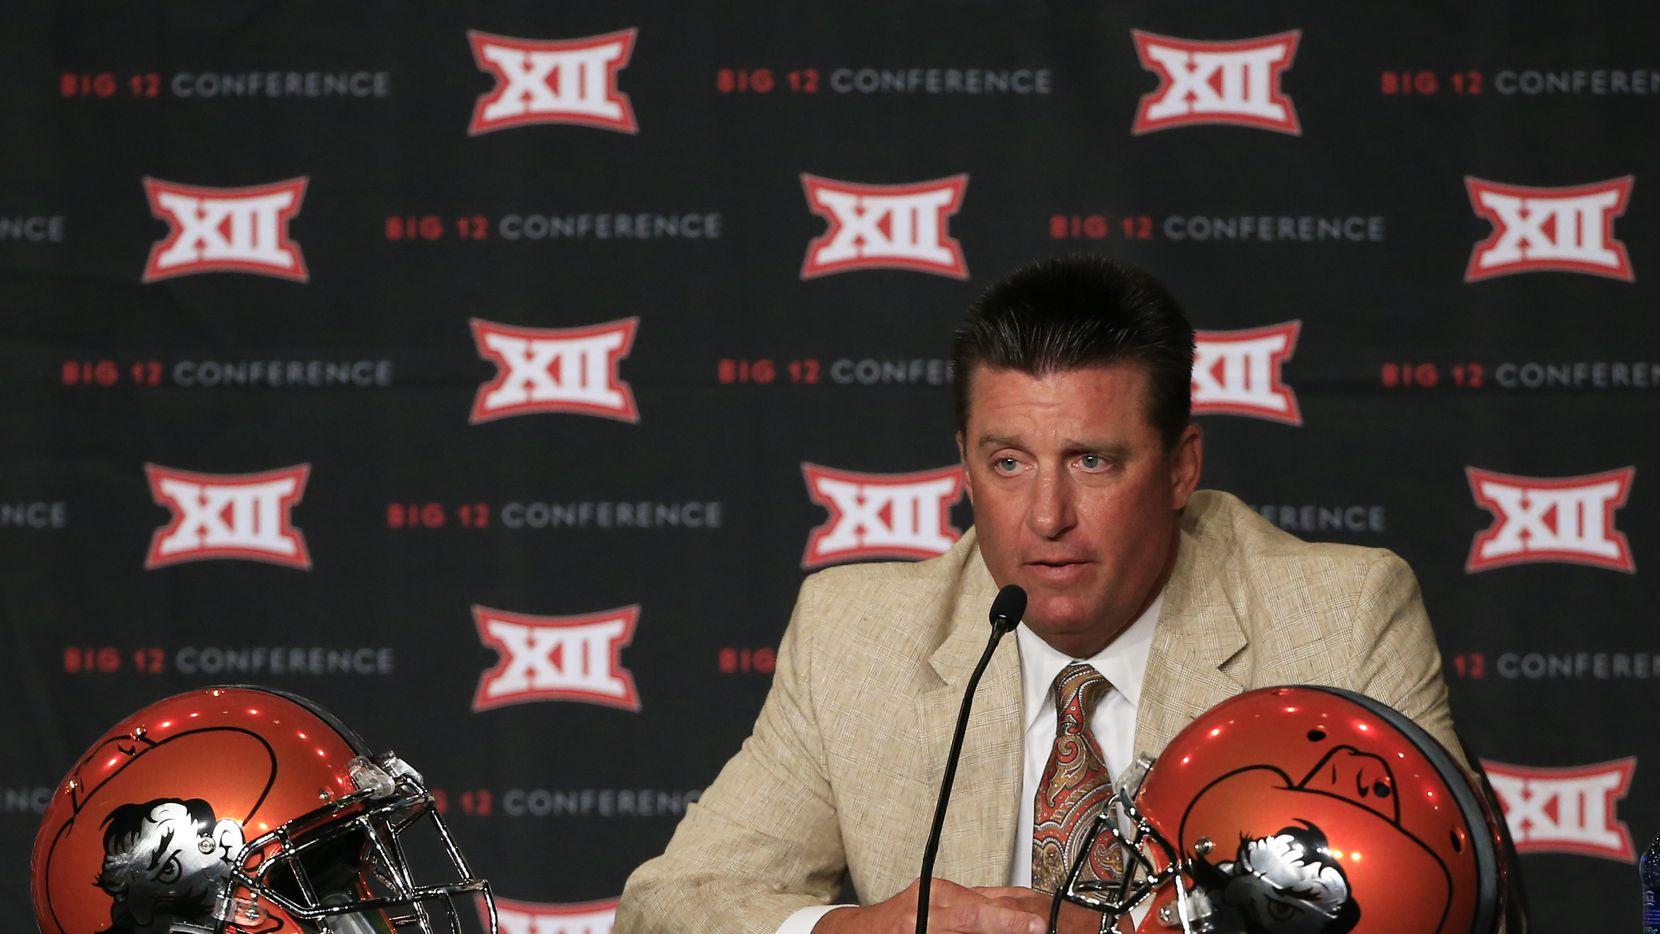 Jul 21, 2015; Dallas, TX, USA; Oklahoma State Cowboys head coach Mike Gundy speaks to the media during the Big 12 Media Days at Omni Dallas. Mandatory Credit: Kevin Jairaj-USA TODAY Sports